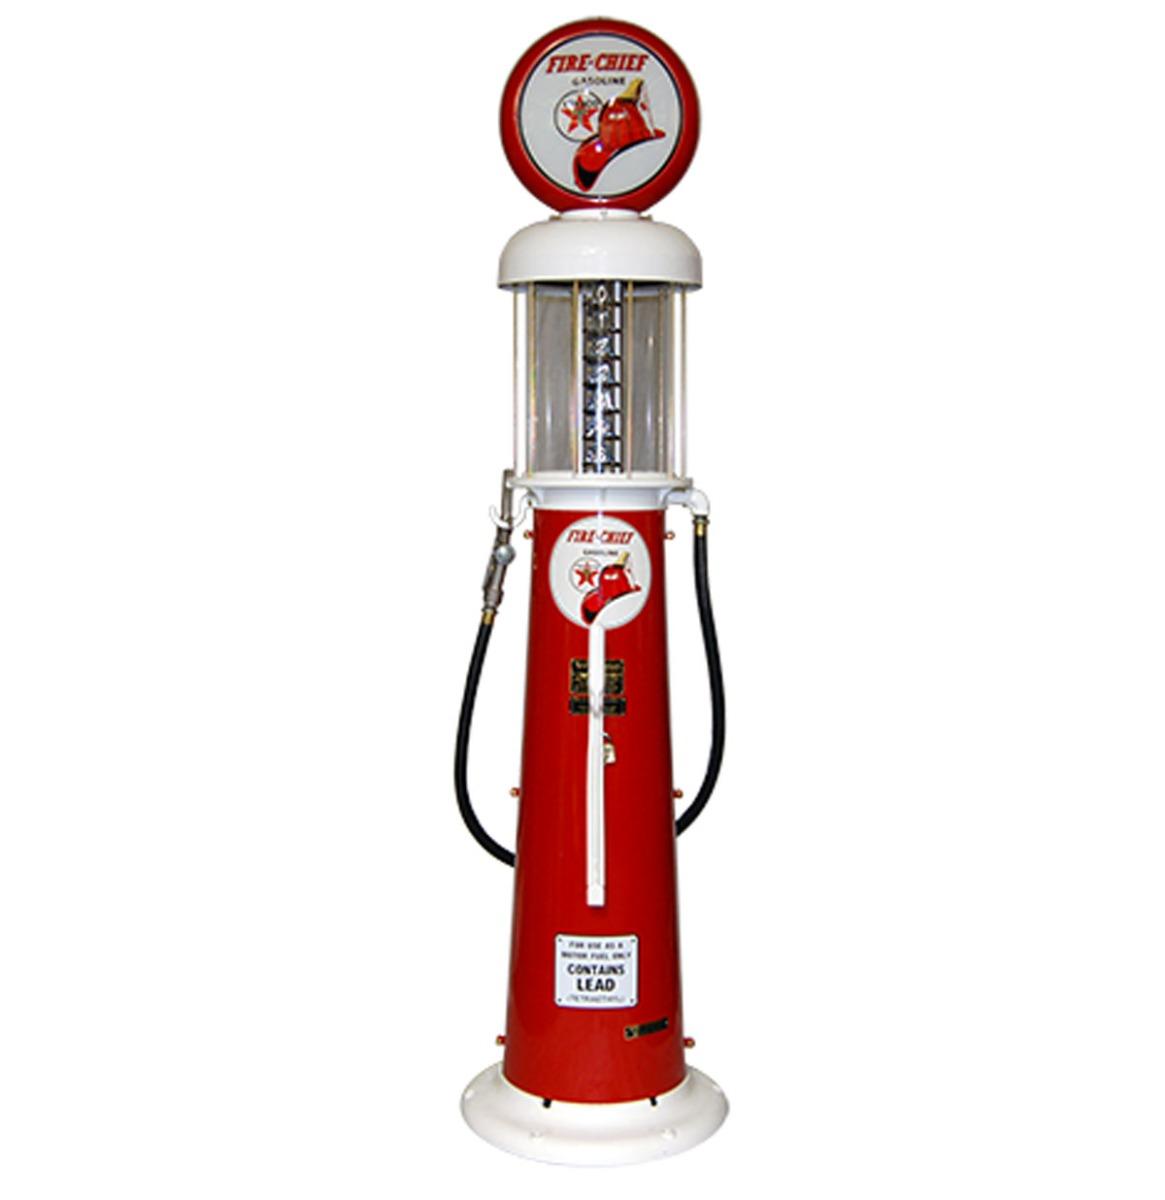 Wayne 615 Texaco Fire-Chief 6 Gallon Benzinepomp - Rood & Wit - Reproductie